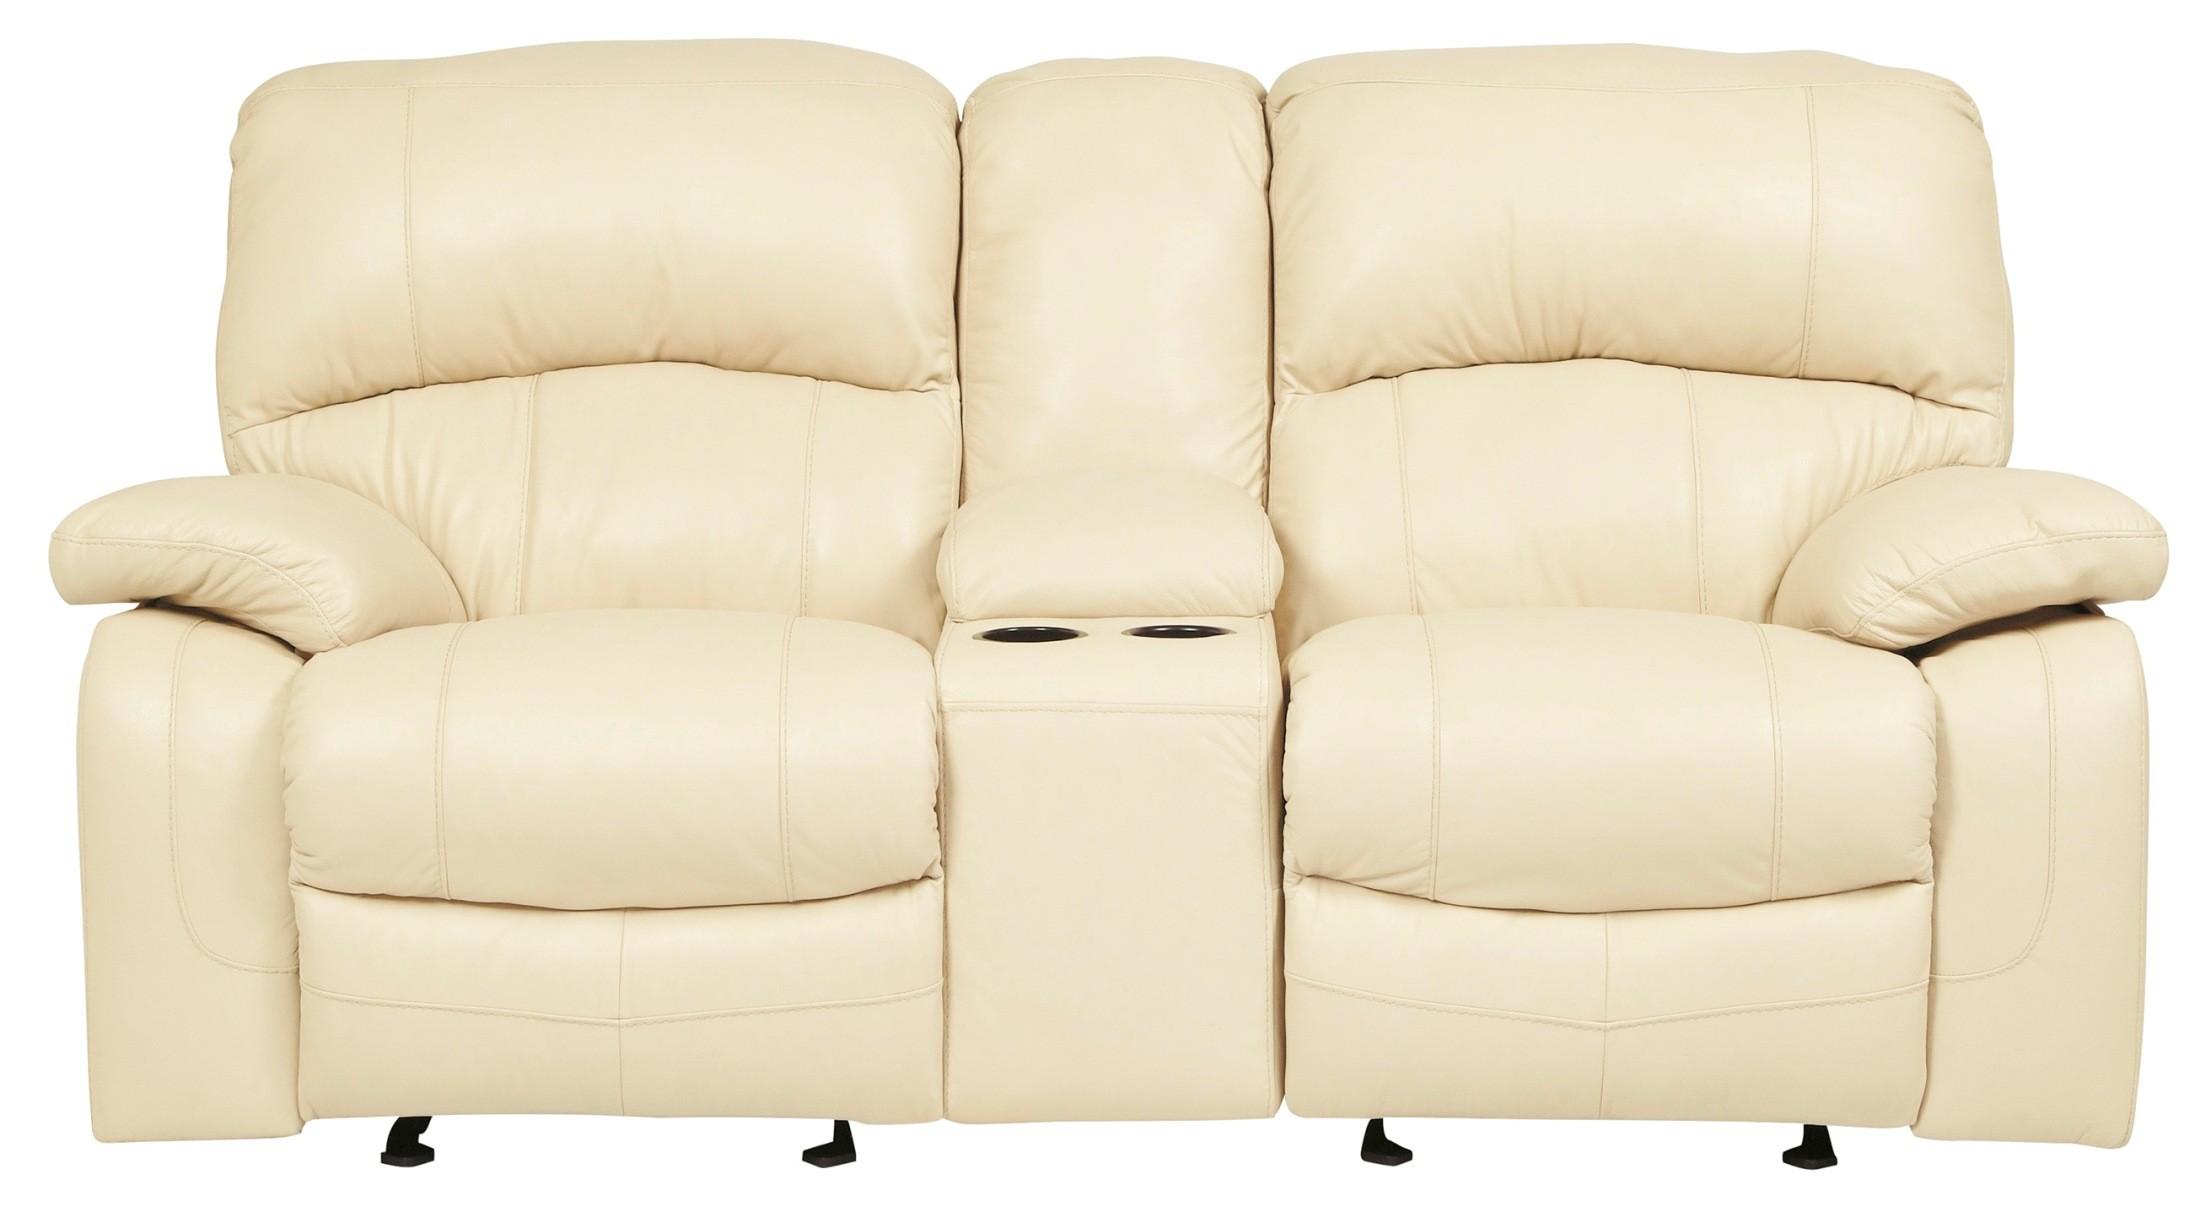 damacio cream glider power reclining loveseat with console